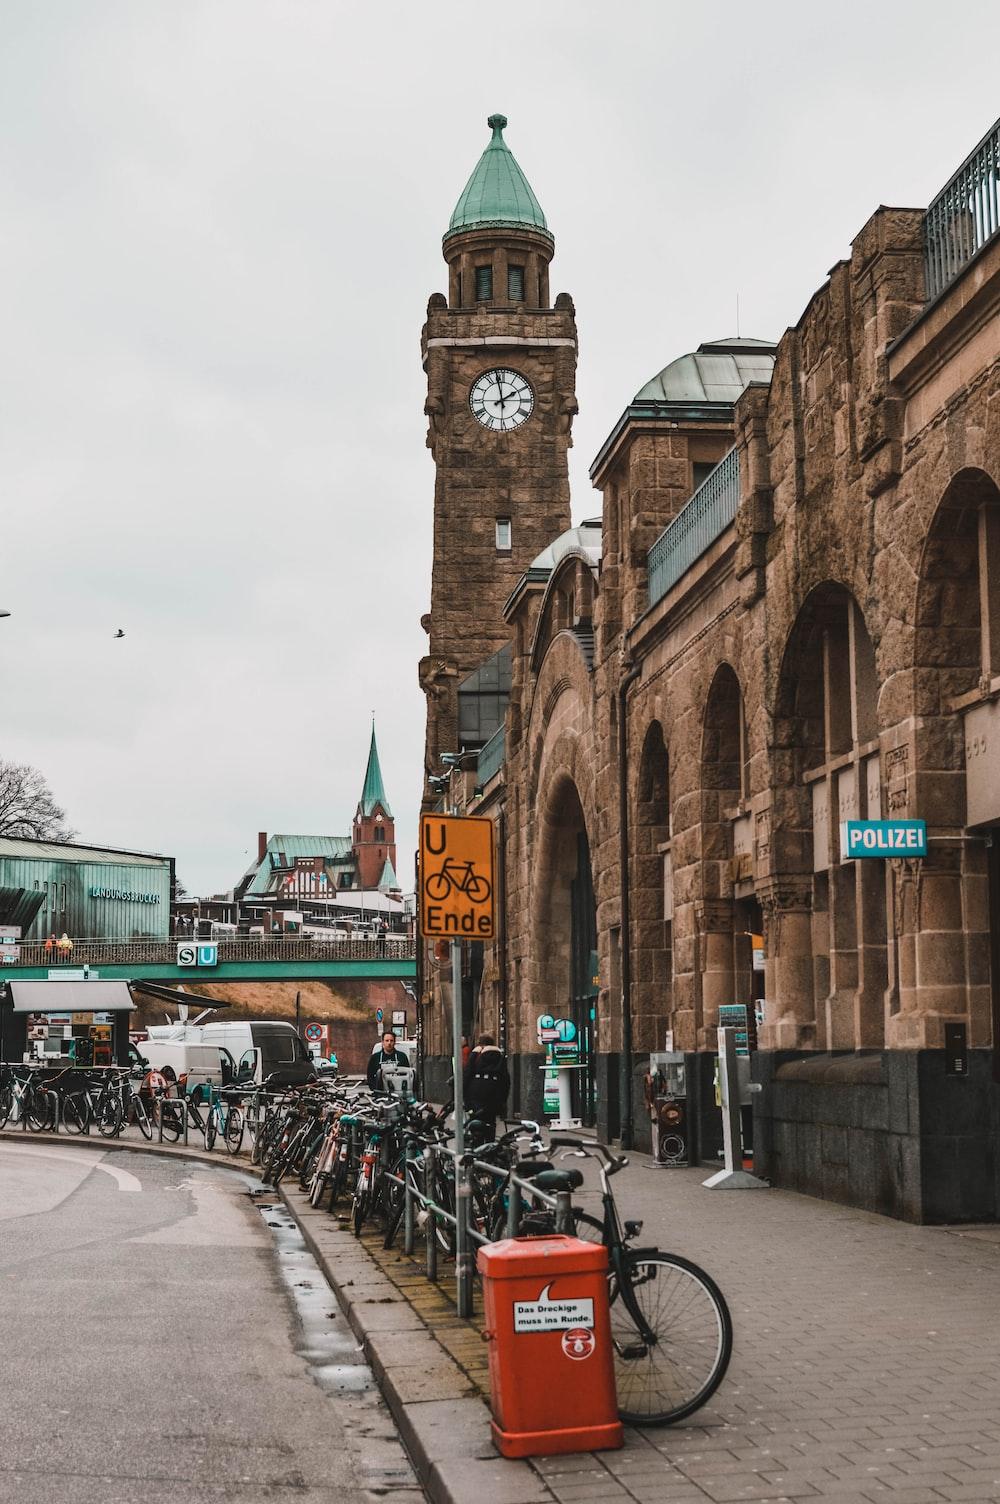 tower clock at daytime